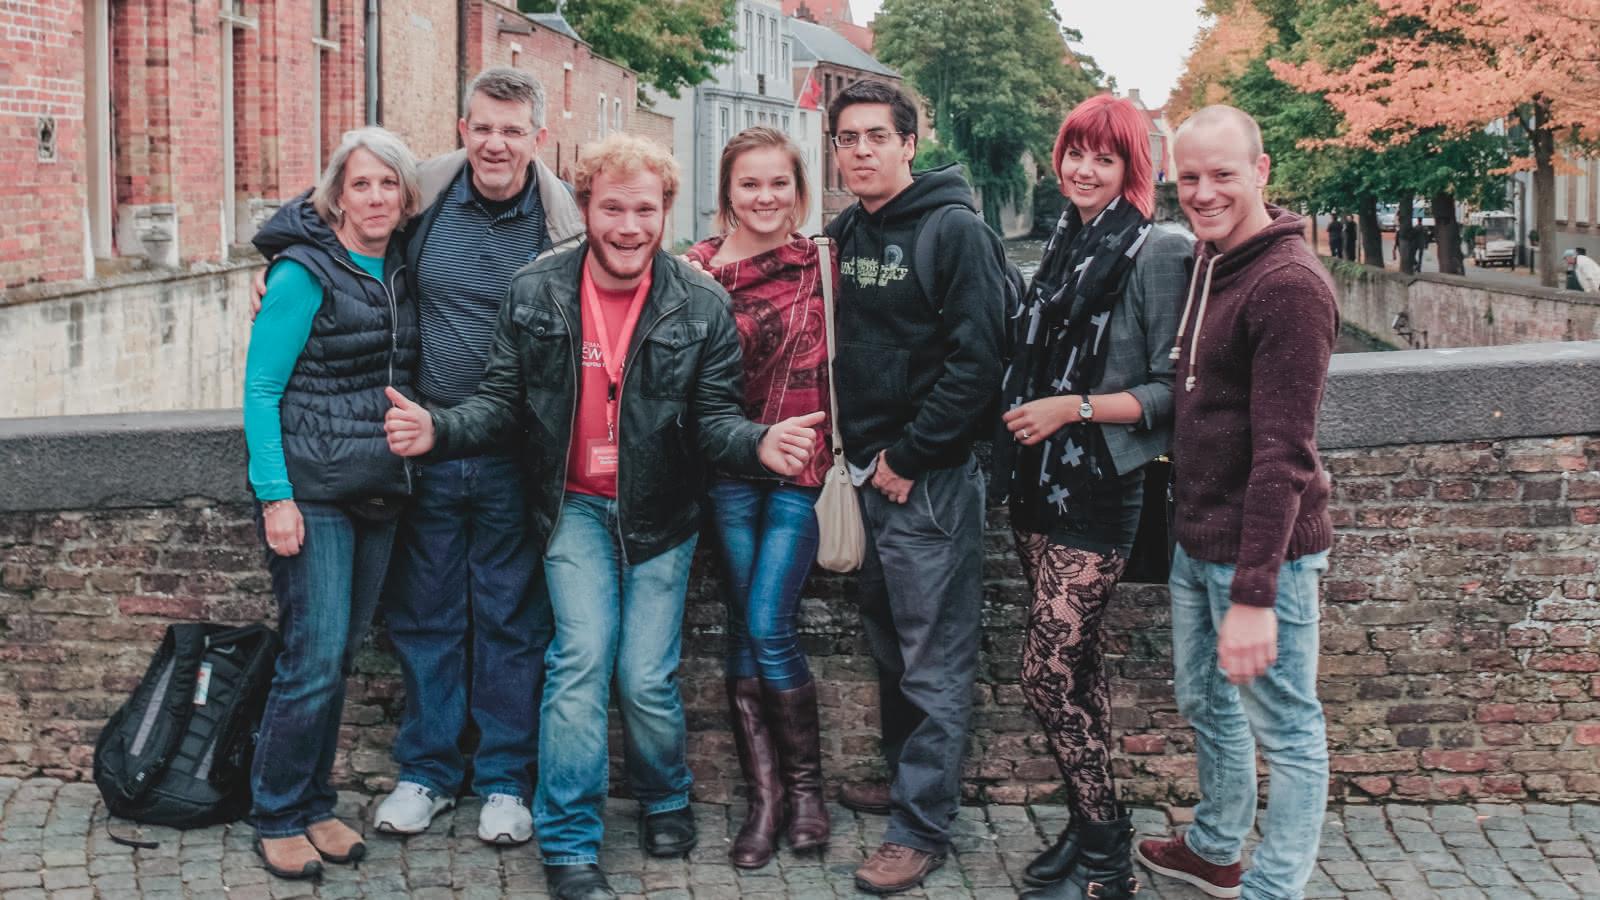 Foto de grupo de los participantes del tour de brujas de sandemans